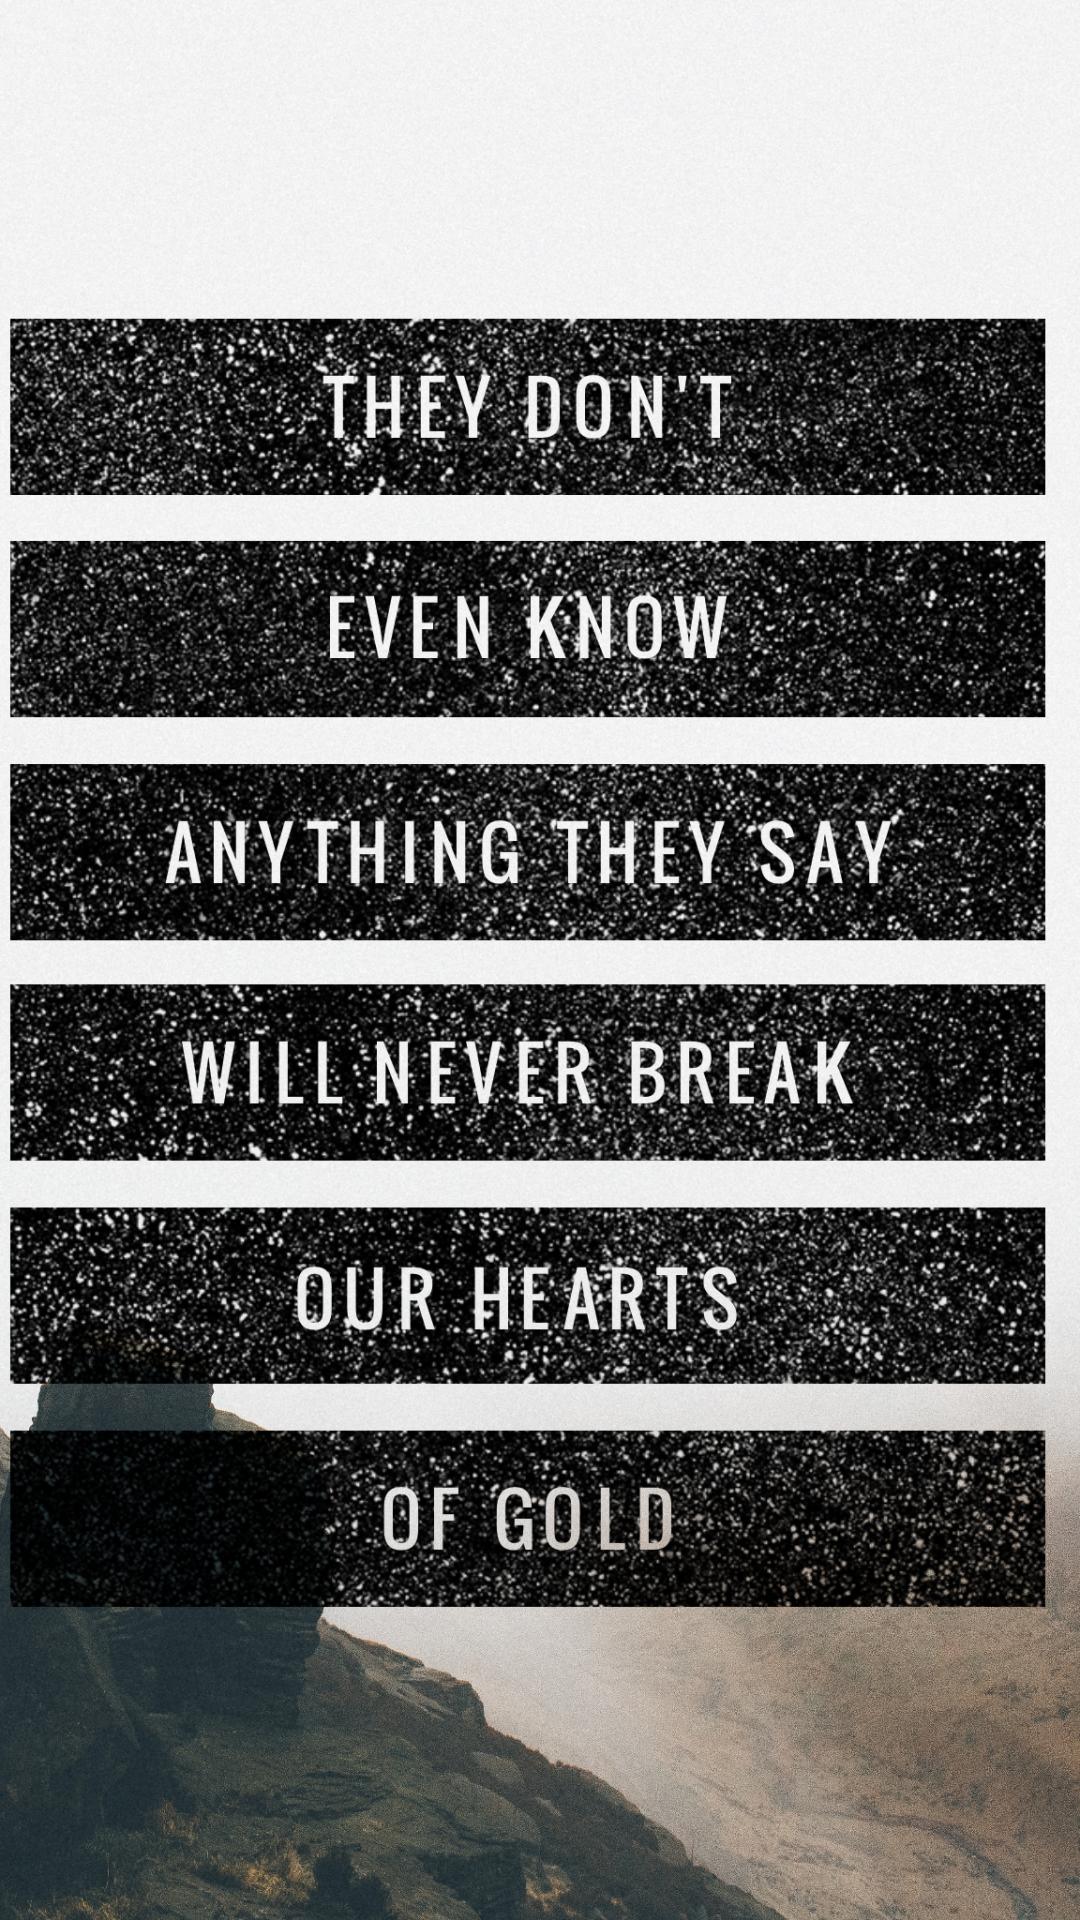 ONE OK ROCK - Wasted Nights 歌詞   iLyricsBuzz